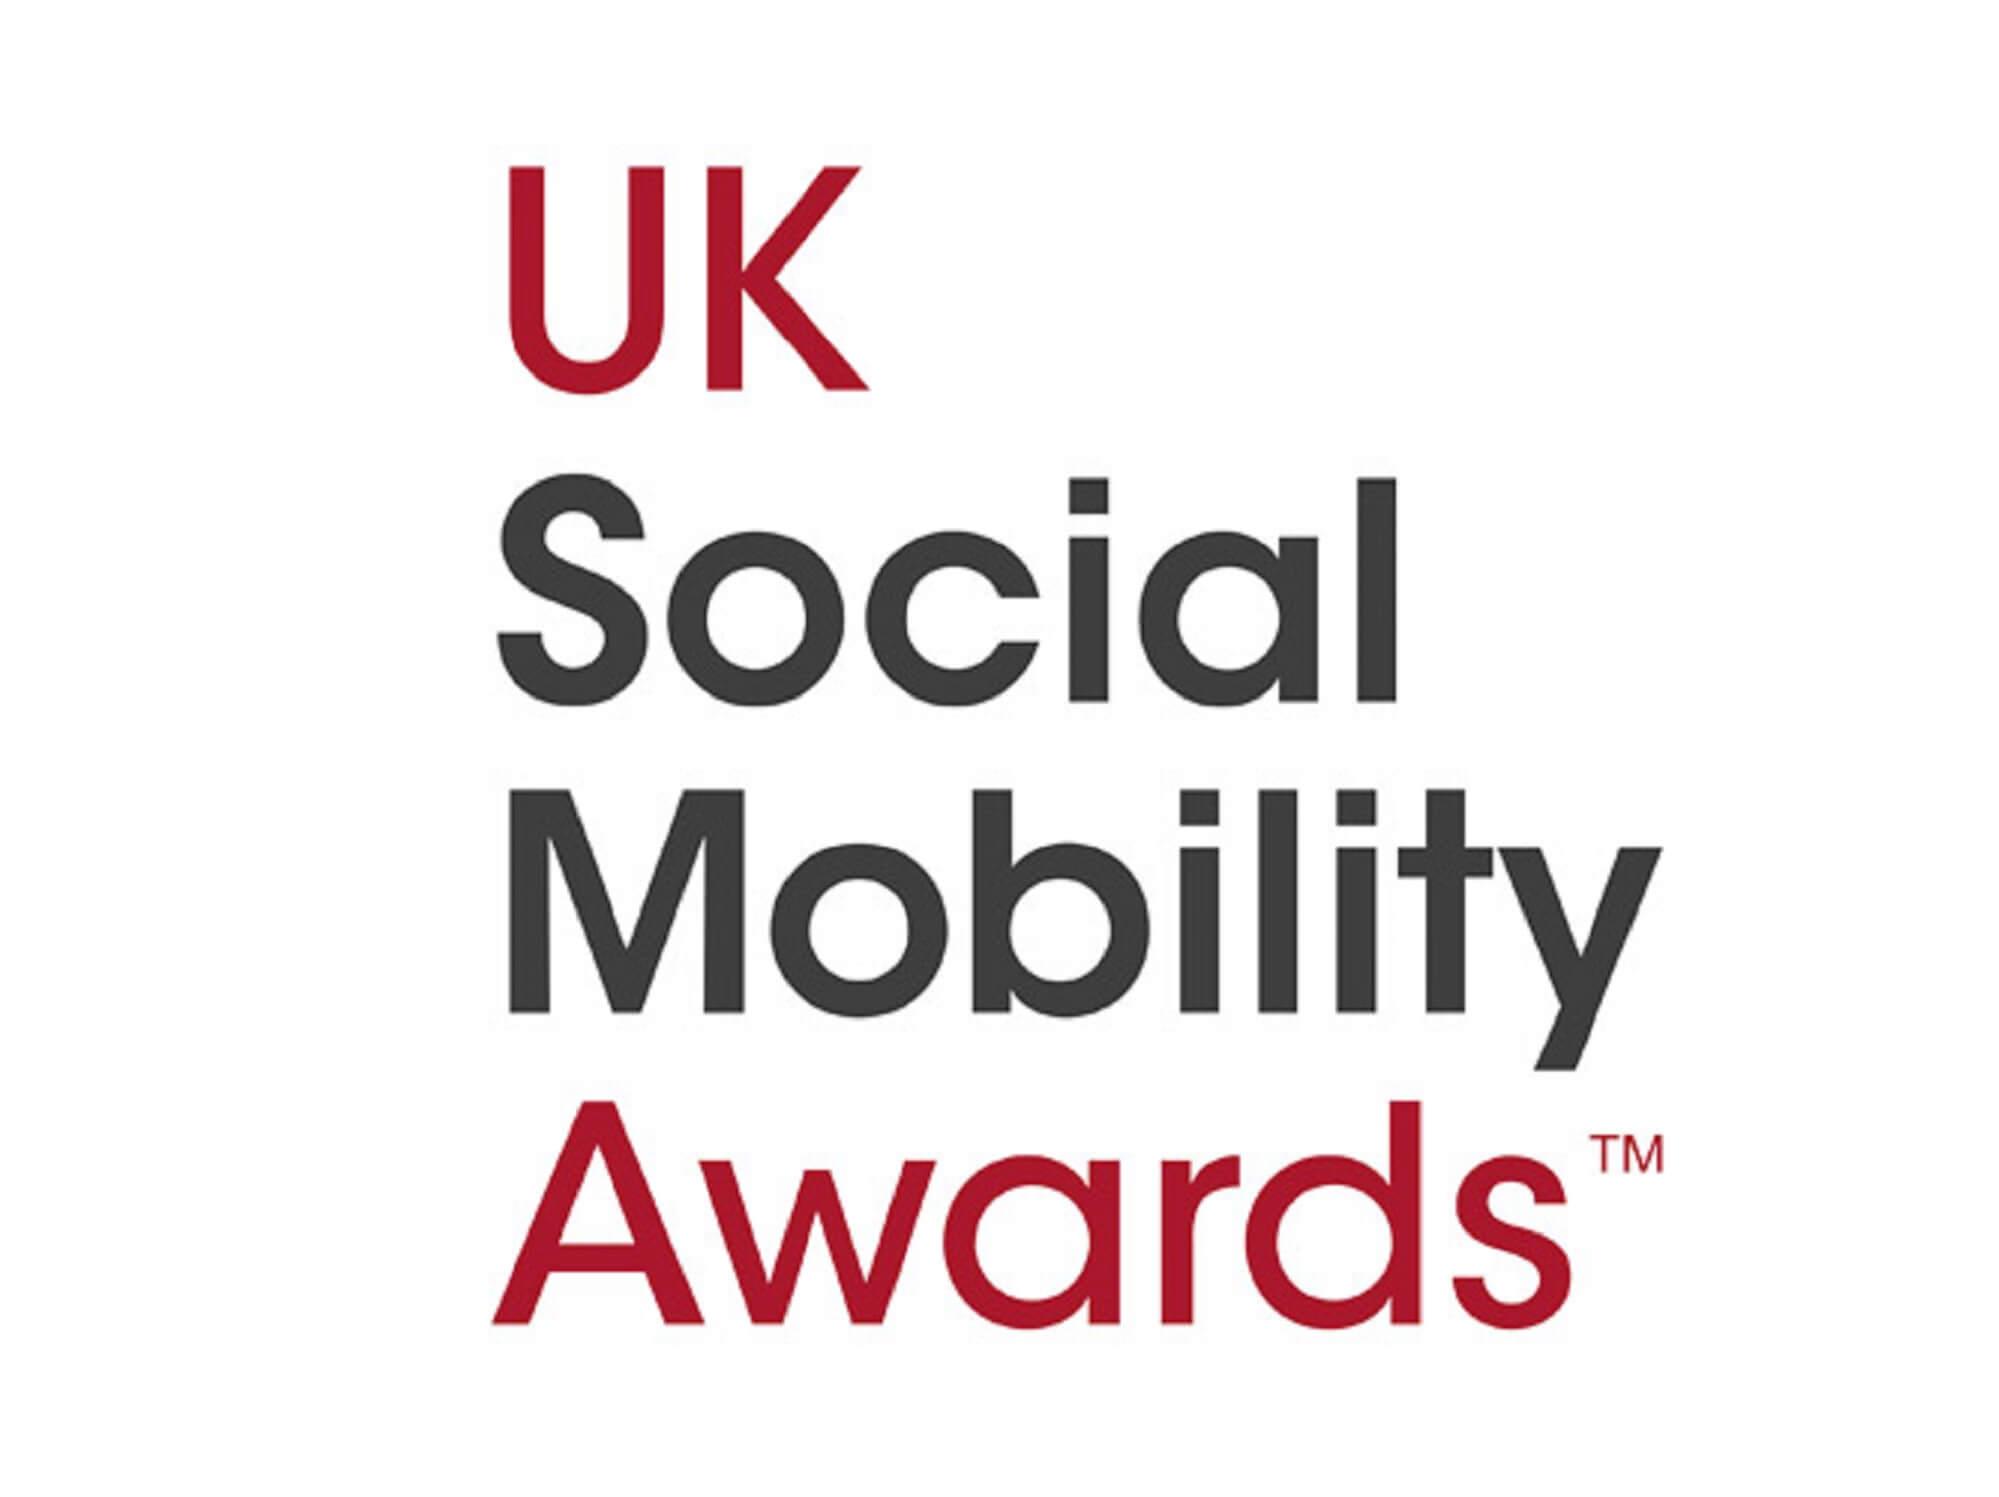 UK Social Mobility Awards logo